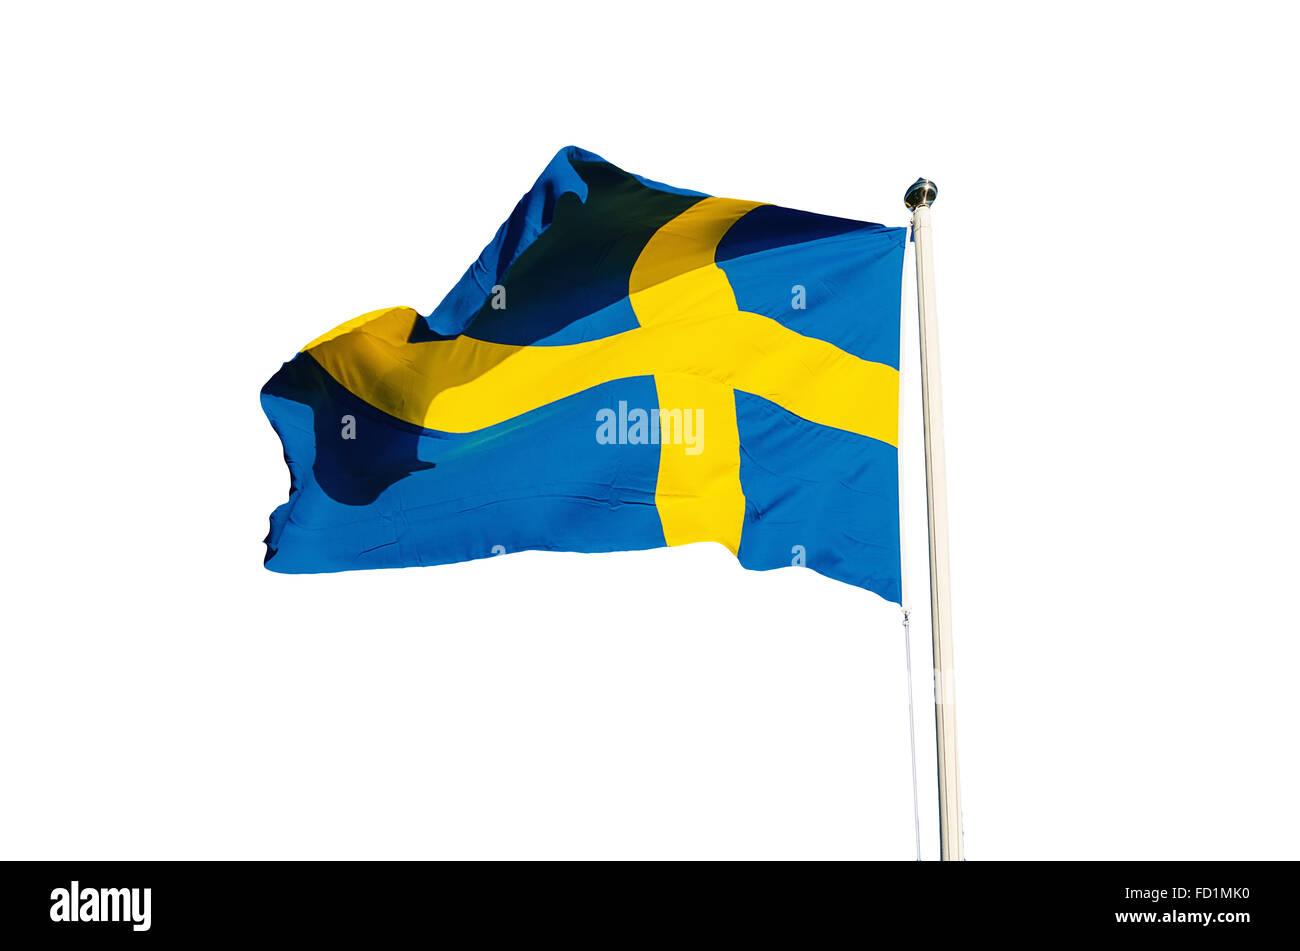 Flag of Sweden - Stock Image